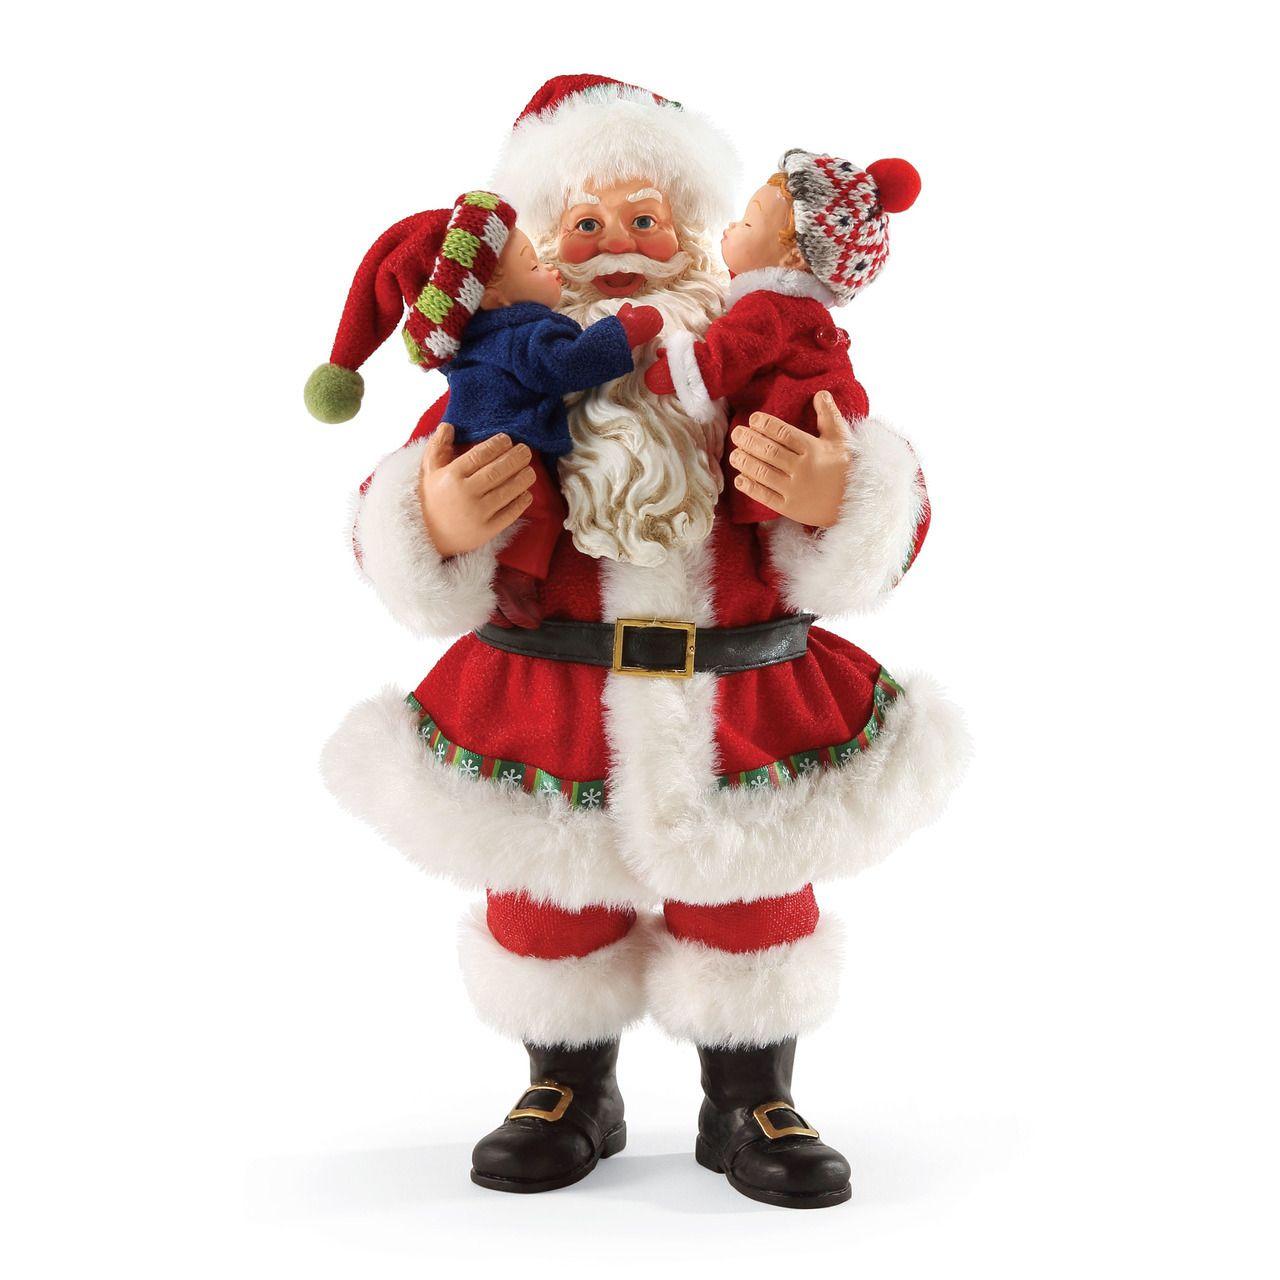 The Jolly Christmas Shop - Department 56 Possible Dreams Santa Merry Kiss-mas 4052402, $70.00 (http://www.thejollychristmasshop.com/department-56-possible-dreams-santa-merry-kiss-mas-4052402/)